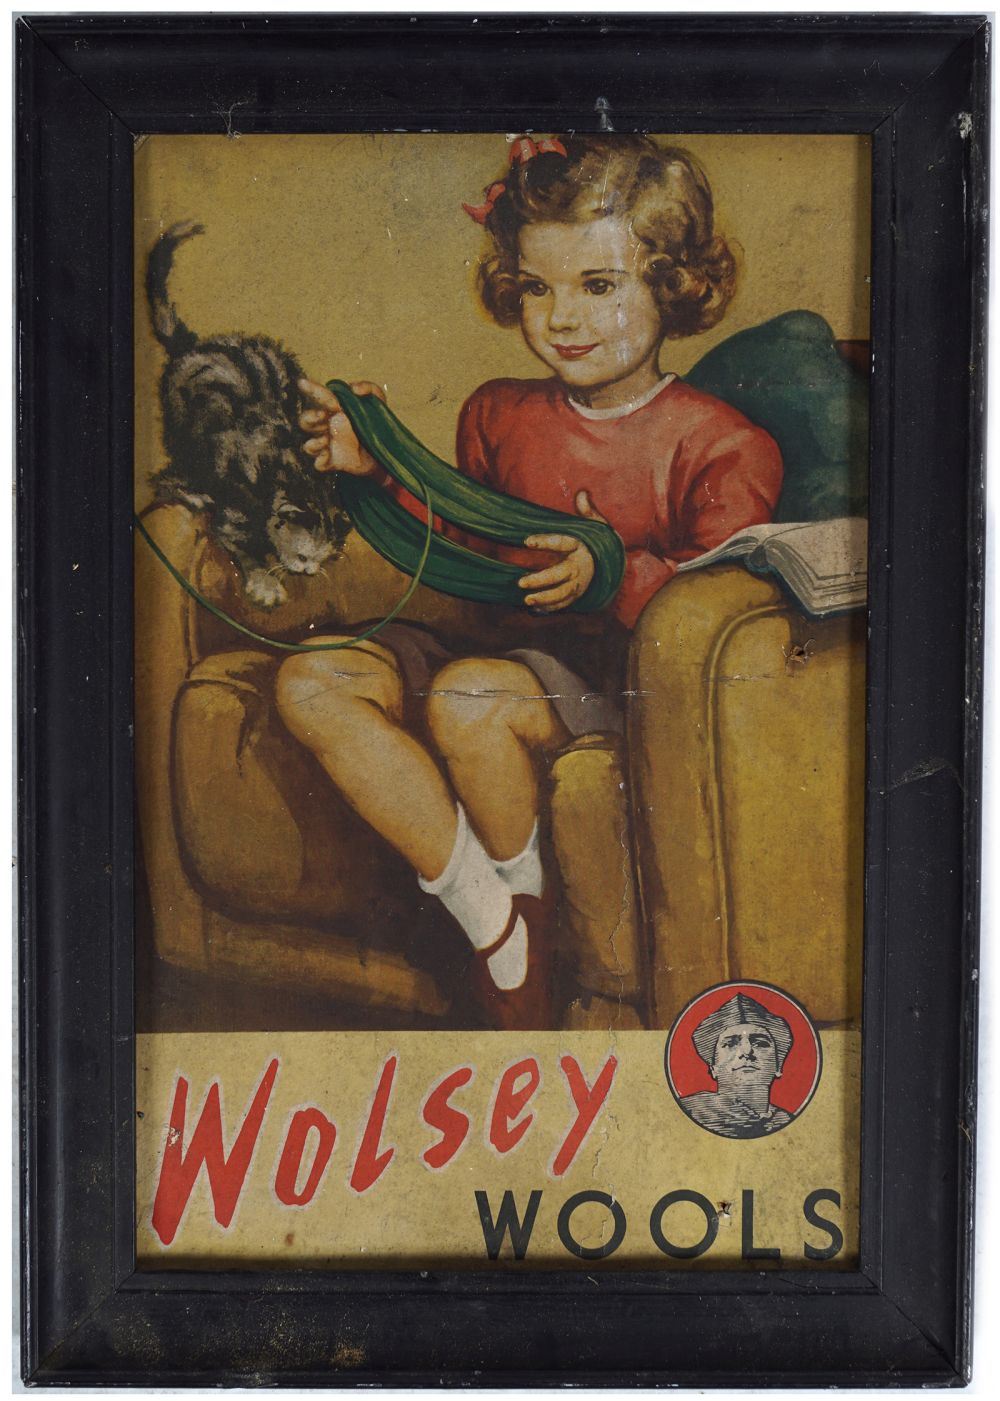 WOLSEY WOOLS ORIGINAL VINTAGE POSTER